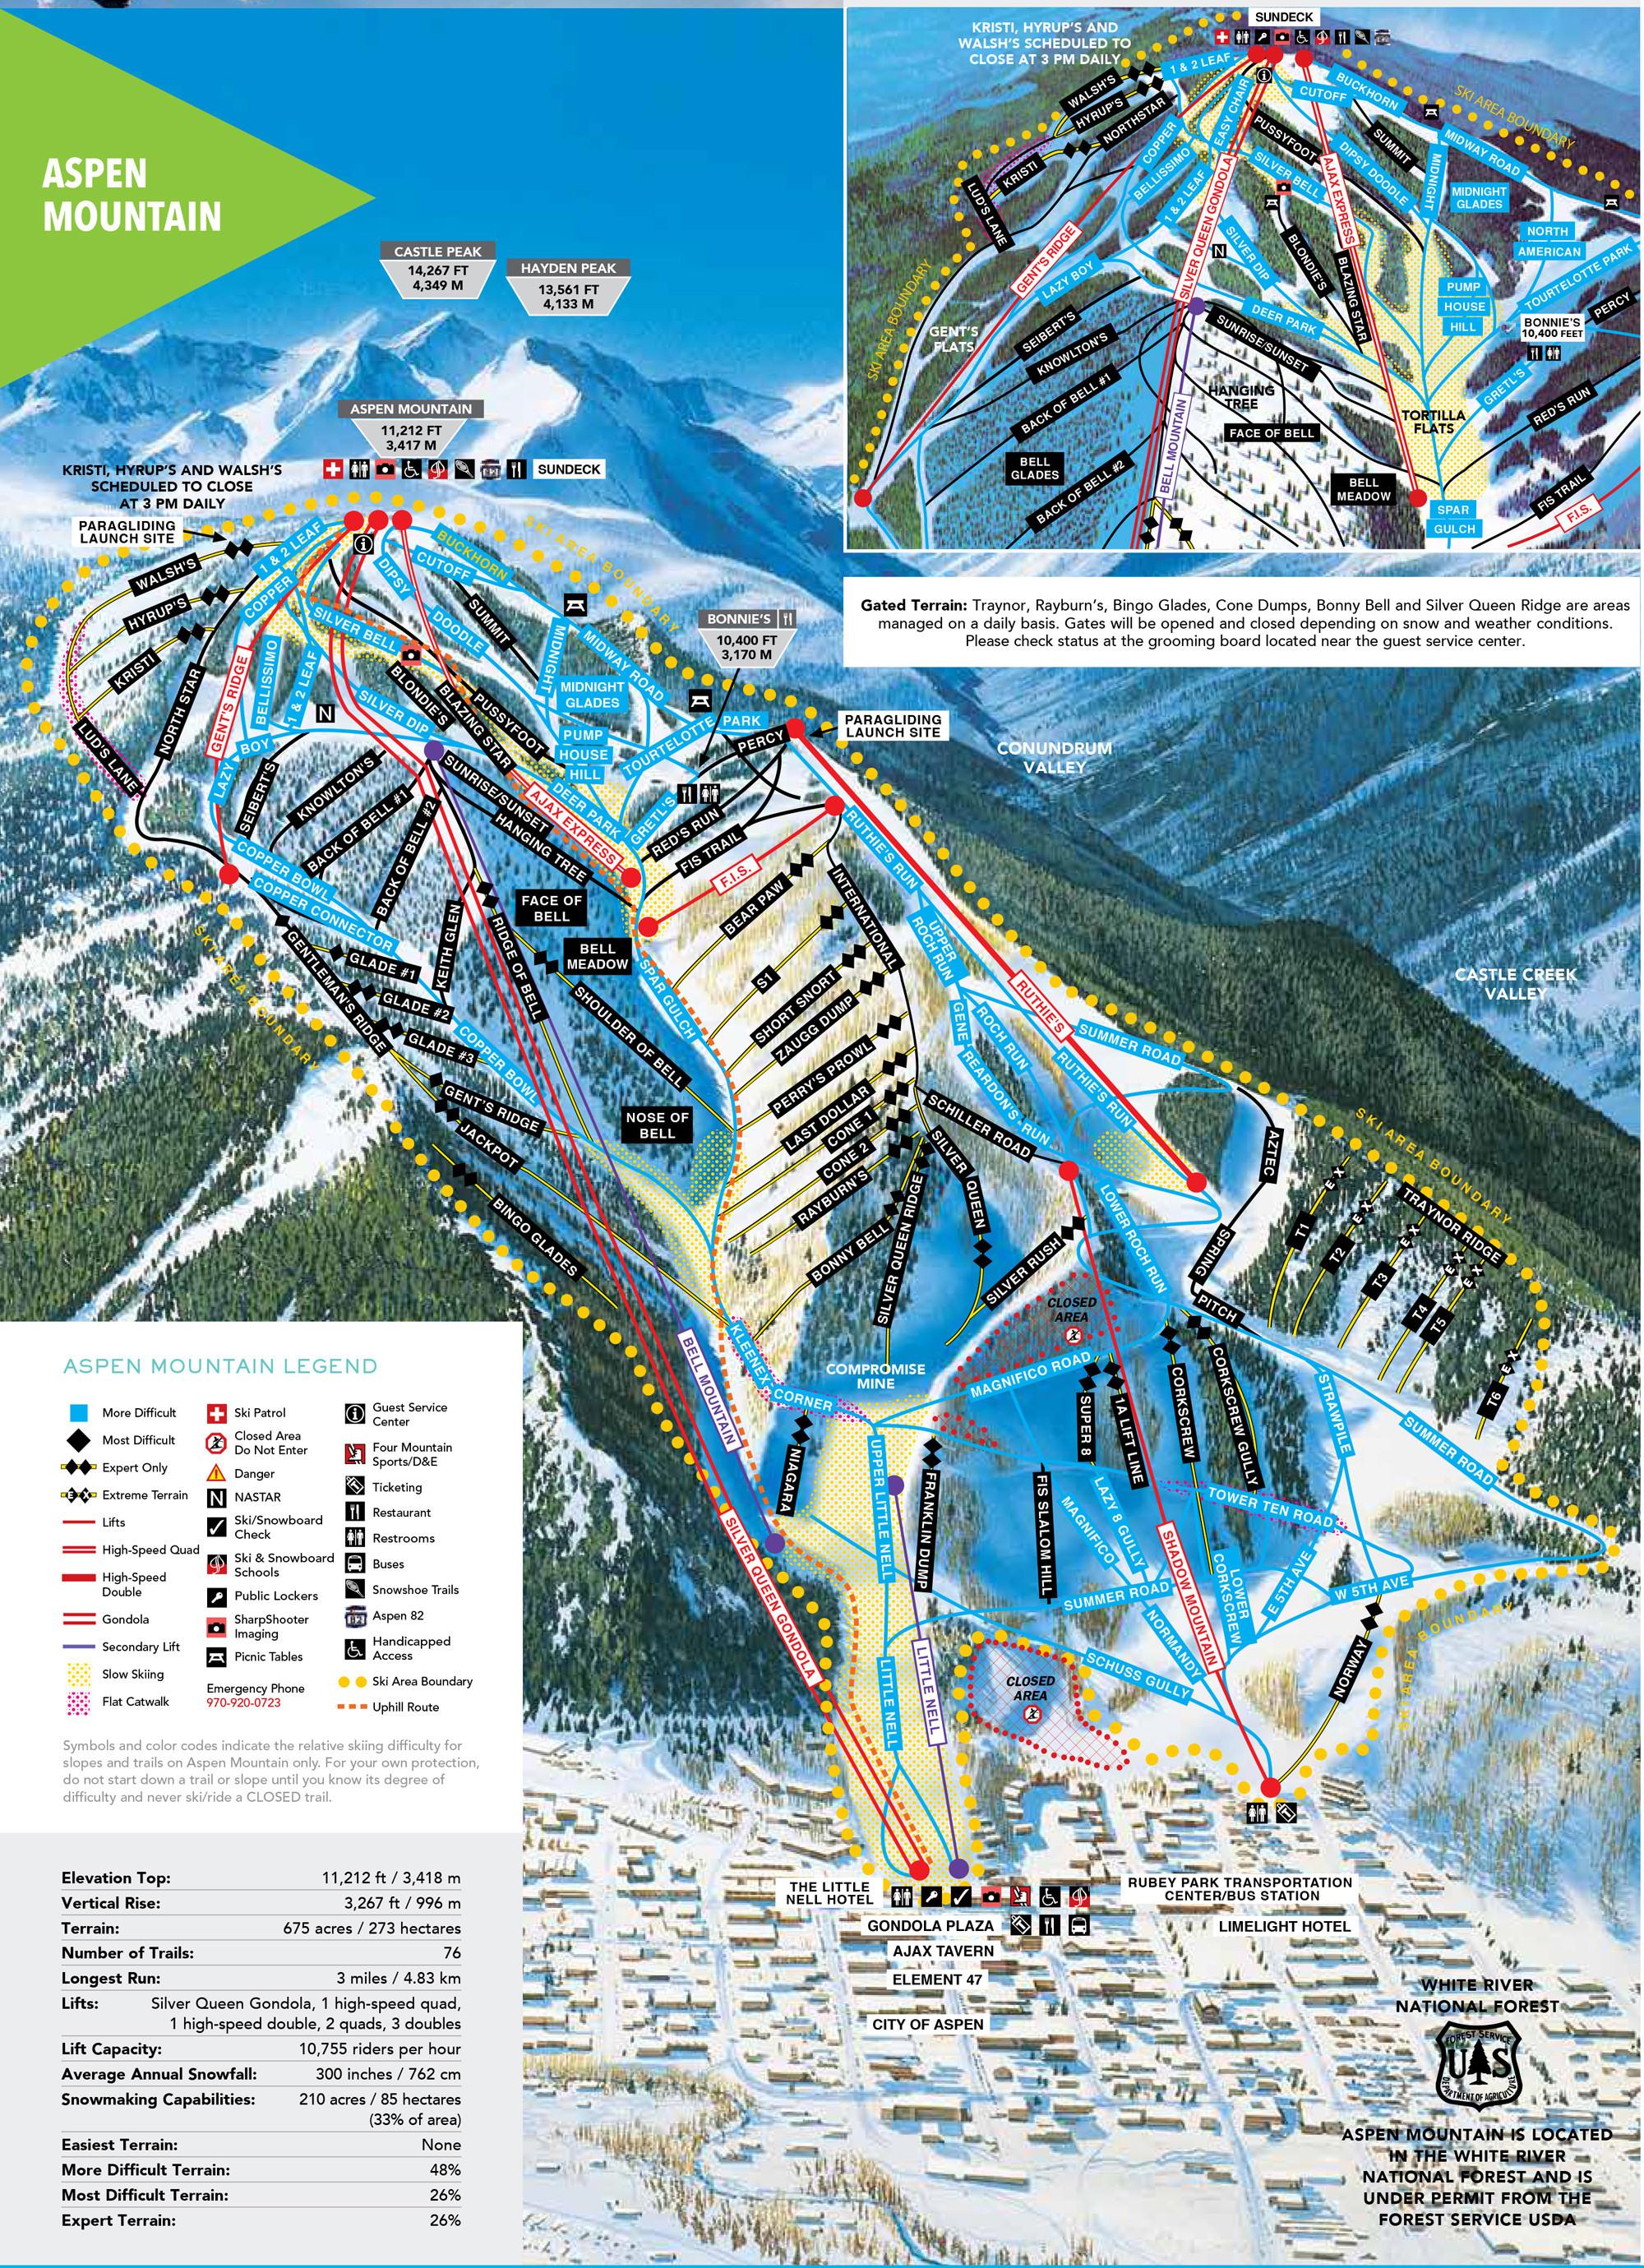 Aspen Mountain Trail Map • Piste Map • Panoramic Mountain Map